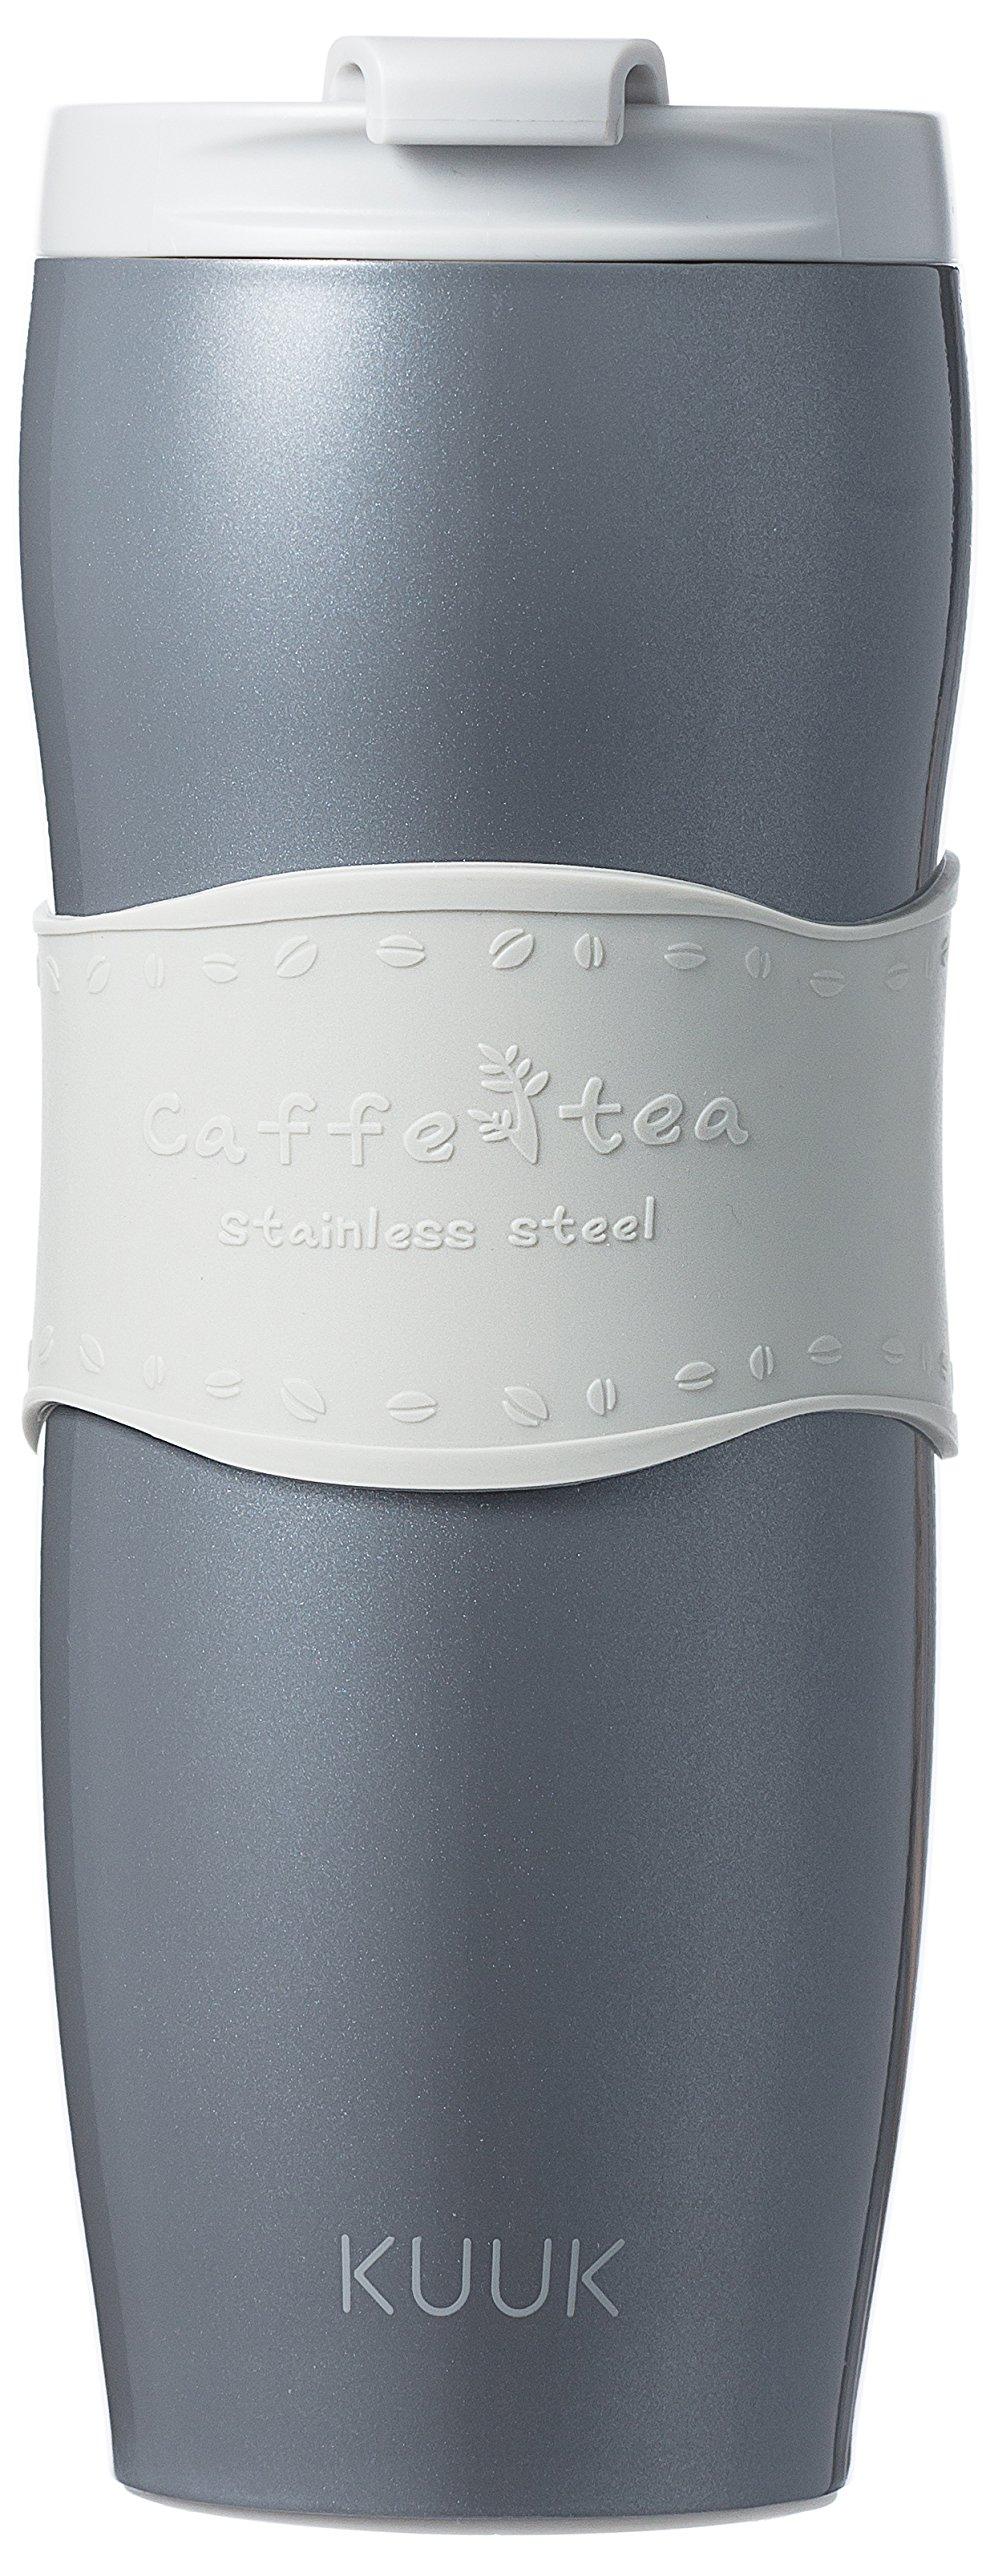 Kuuk Travel Cup Thermos Mug For Coffee & Tea - Stainless Steel - 12Oz 8